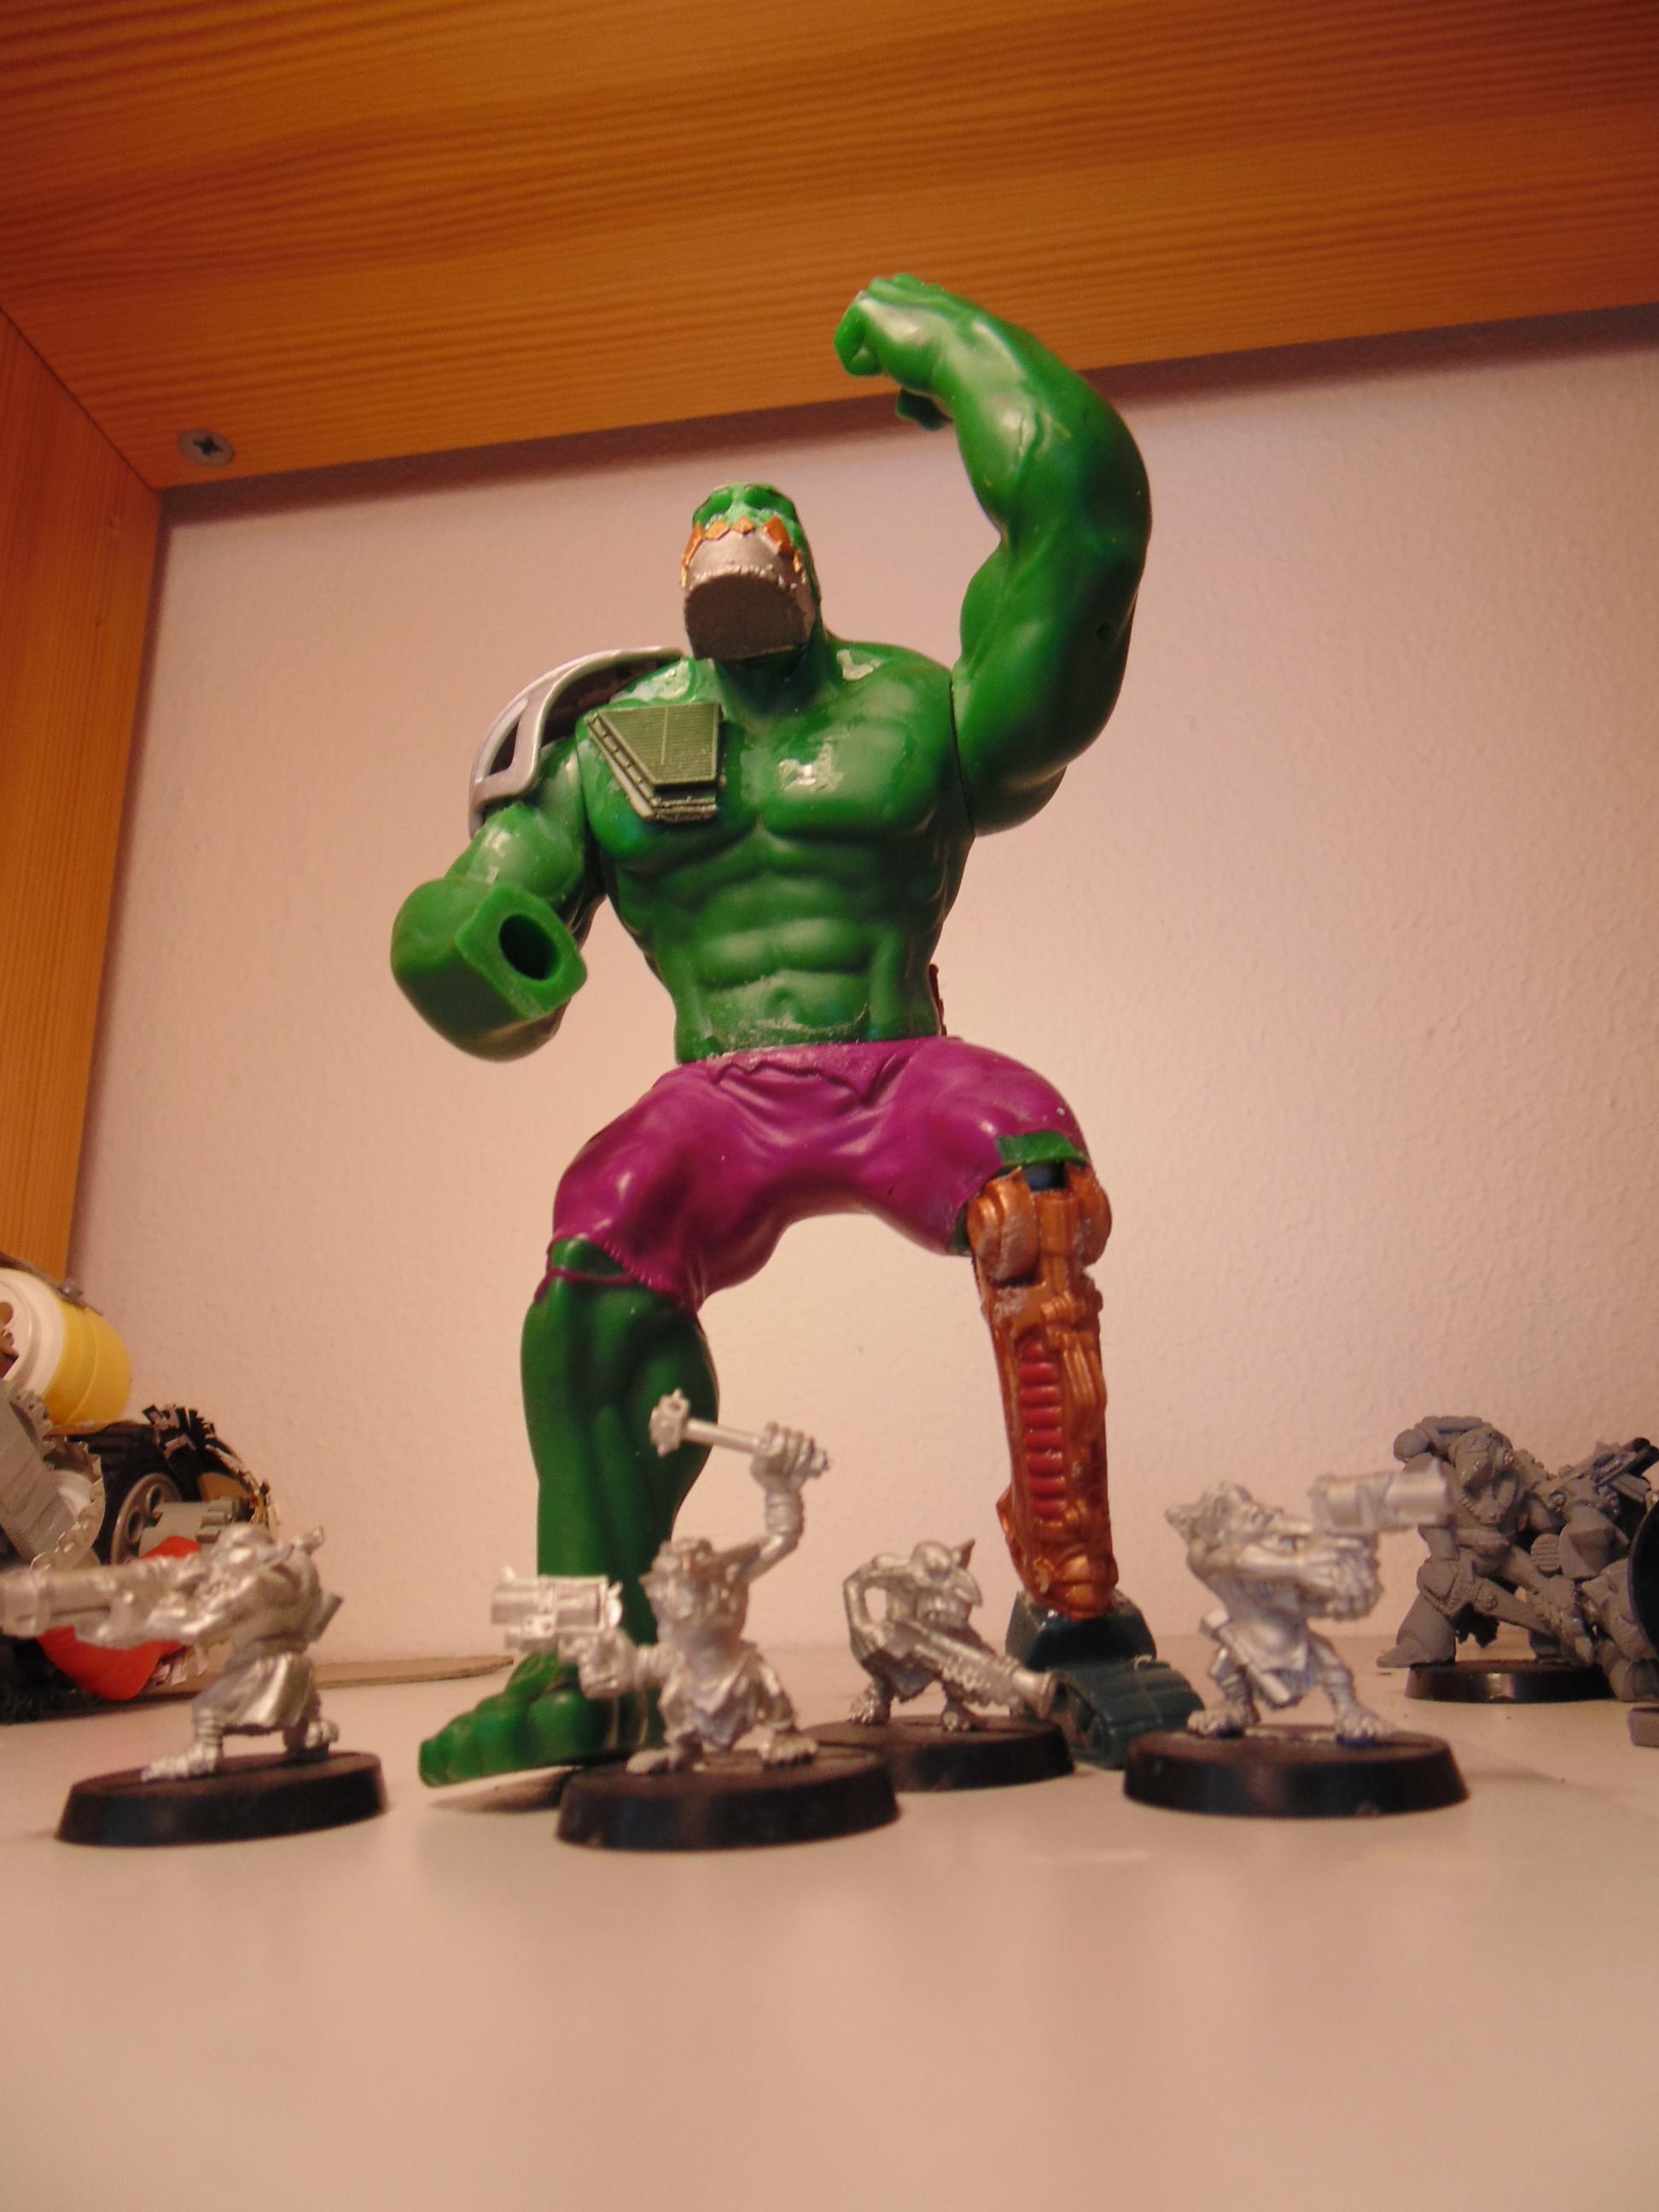 Boss, Conversion, Garbage, Garbage Garden Gnome, Garden, Ggg, Gigant, Gnomes, Huge, Hulk, Mega, Orks, Oversize, Waagh